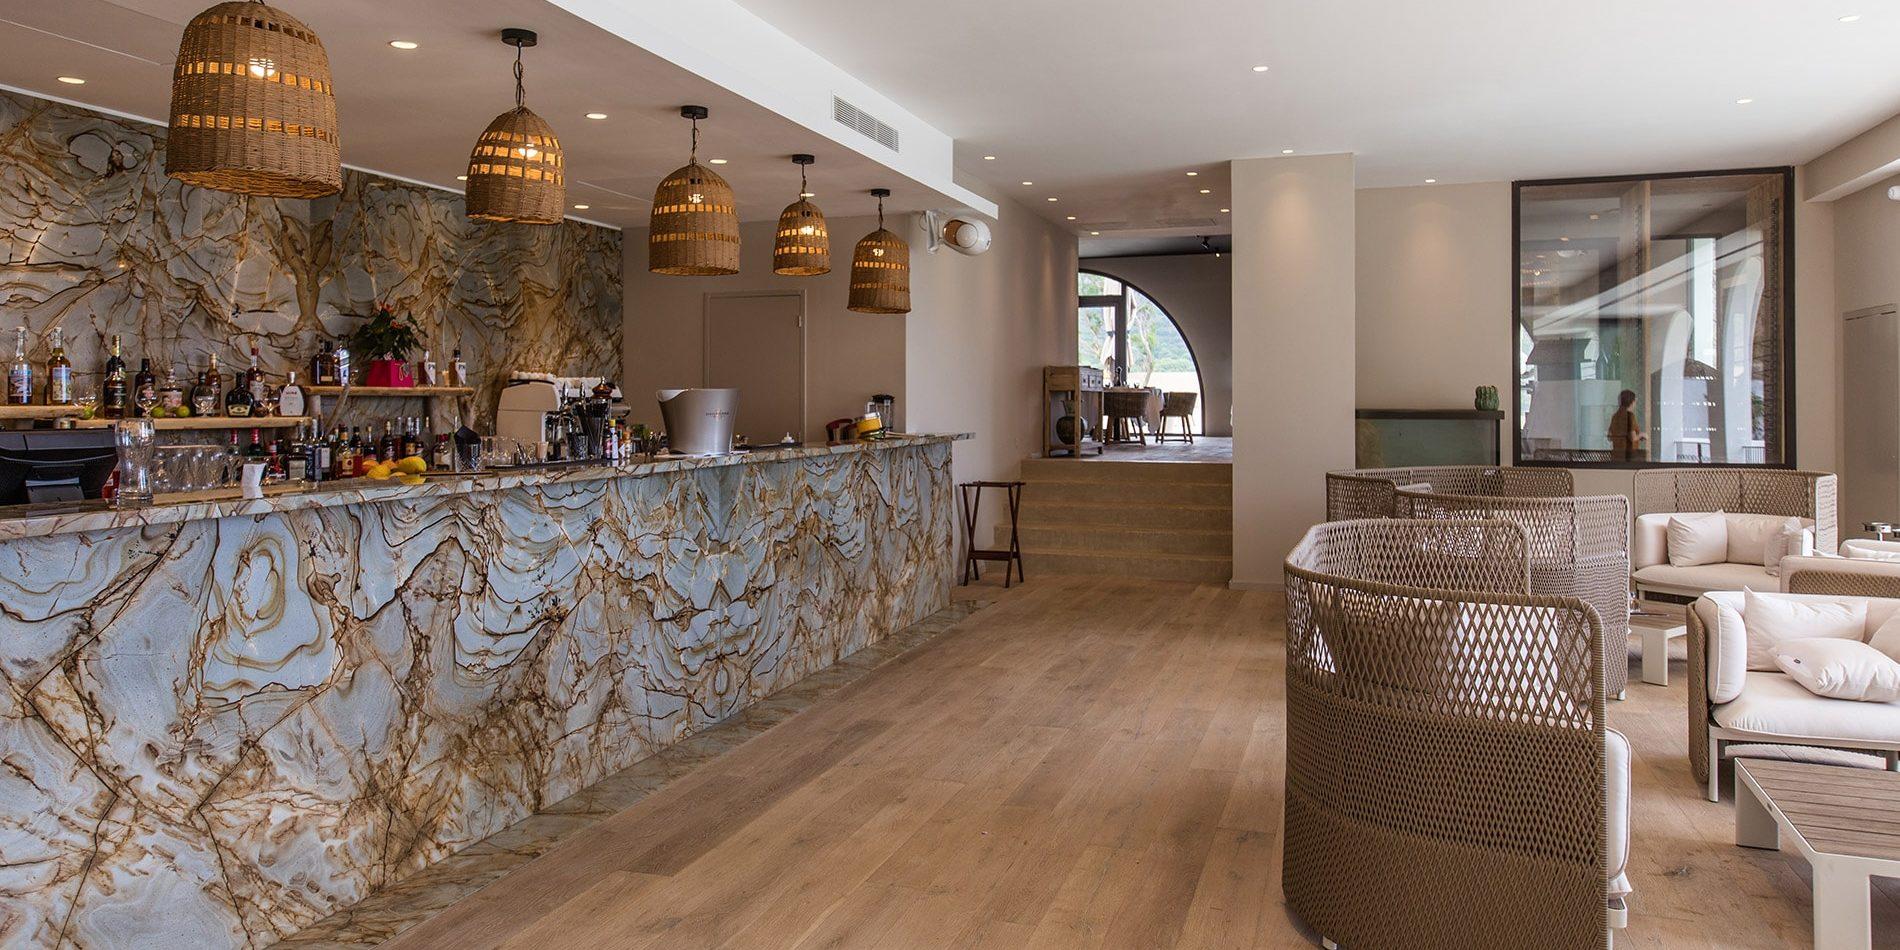 Hotel Misincu Cagnano Cap Corse Corsica Frankrijk entree restaurant lounge bar